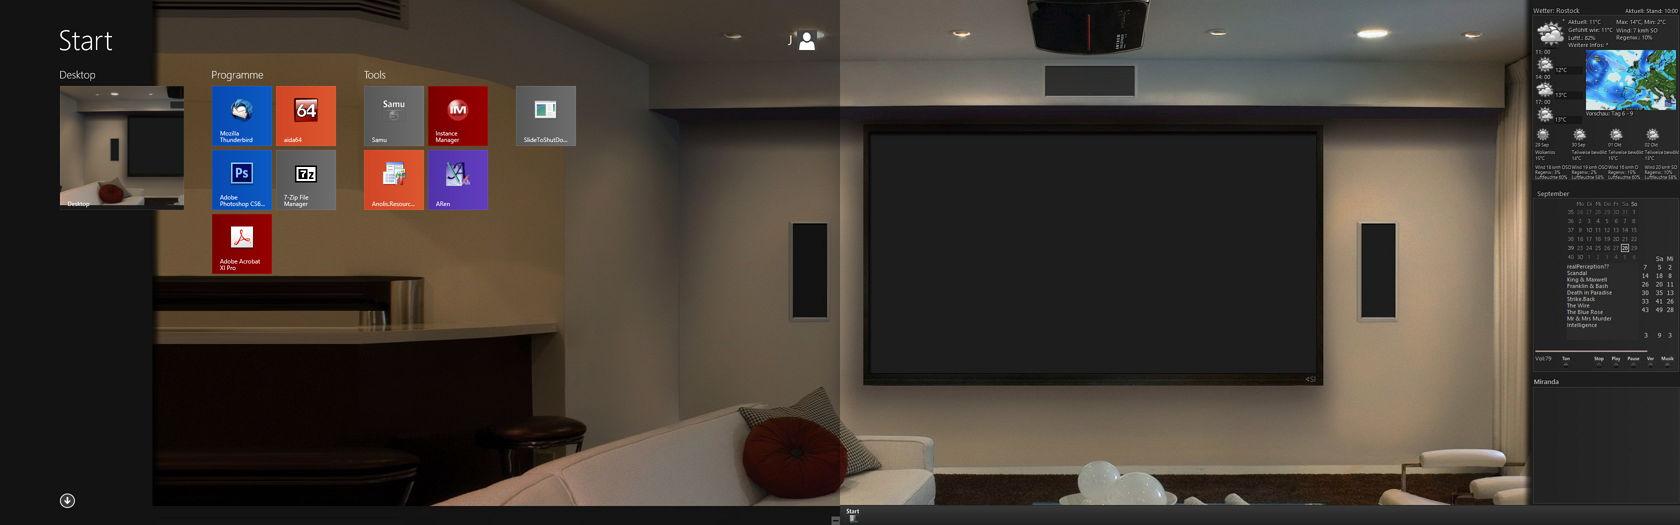 zwei monitore windows 10